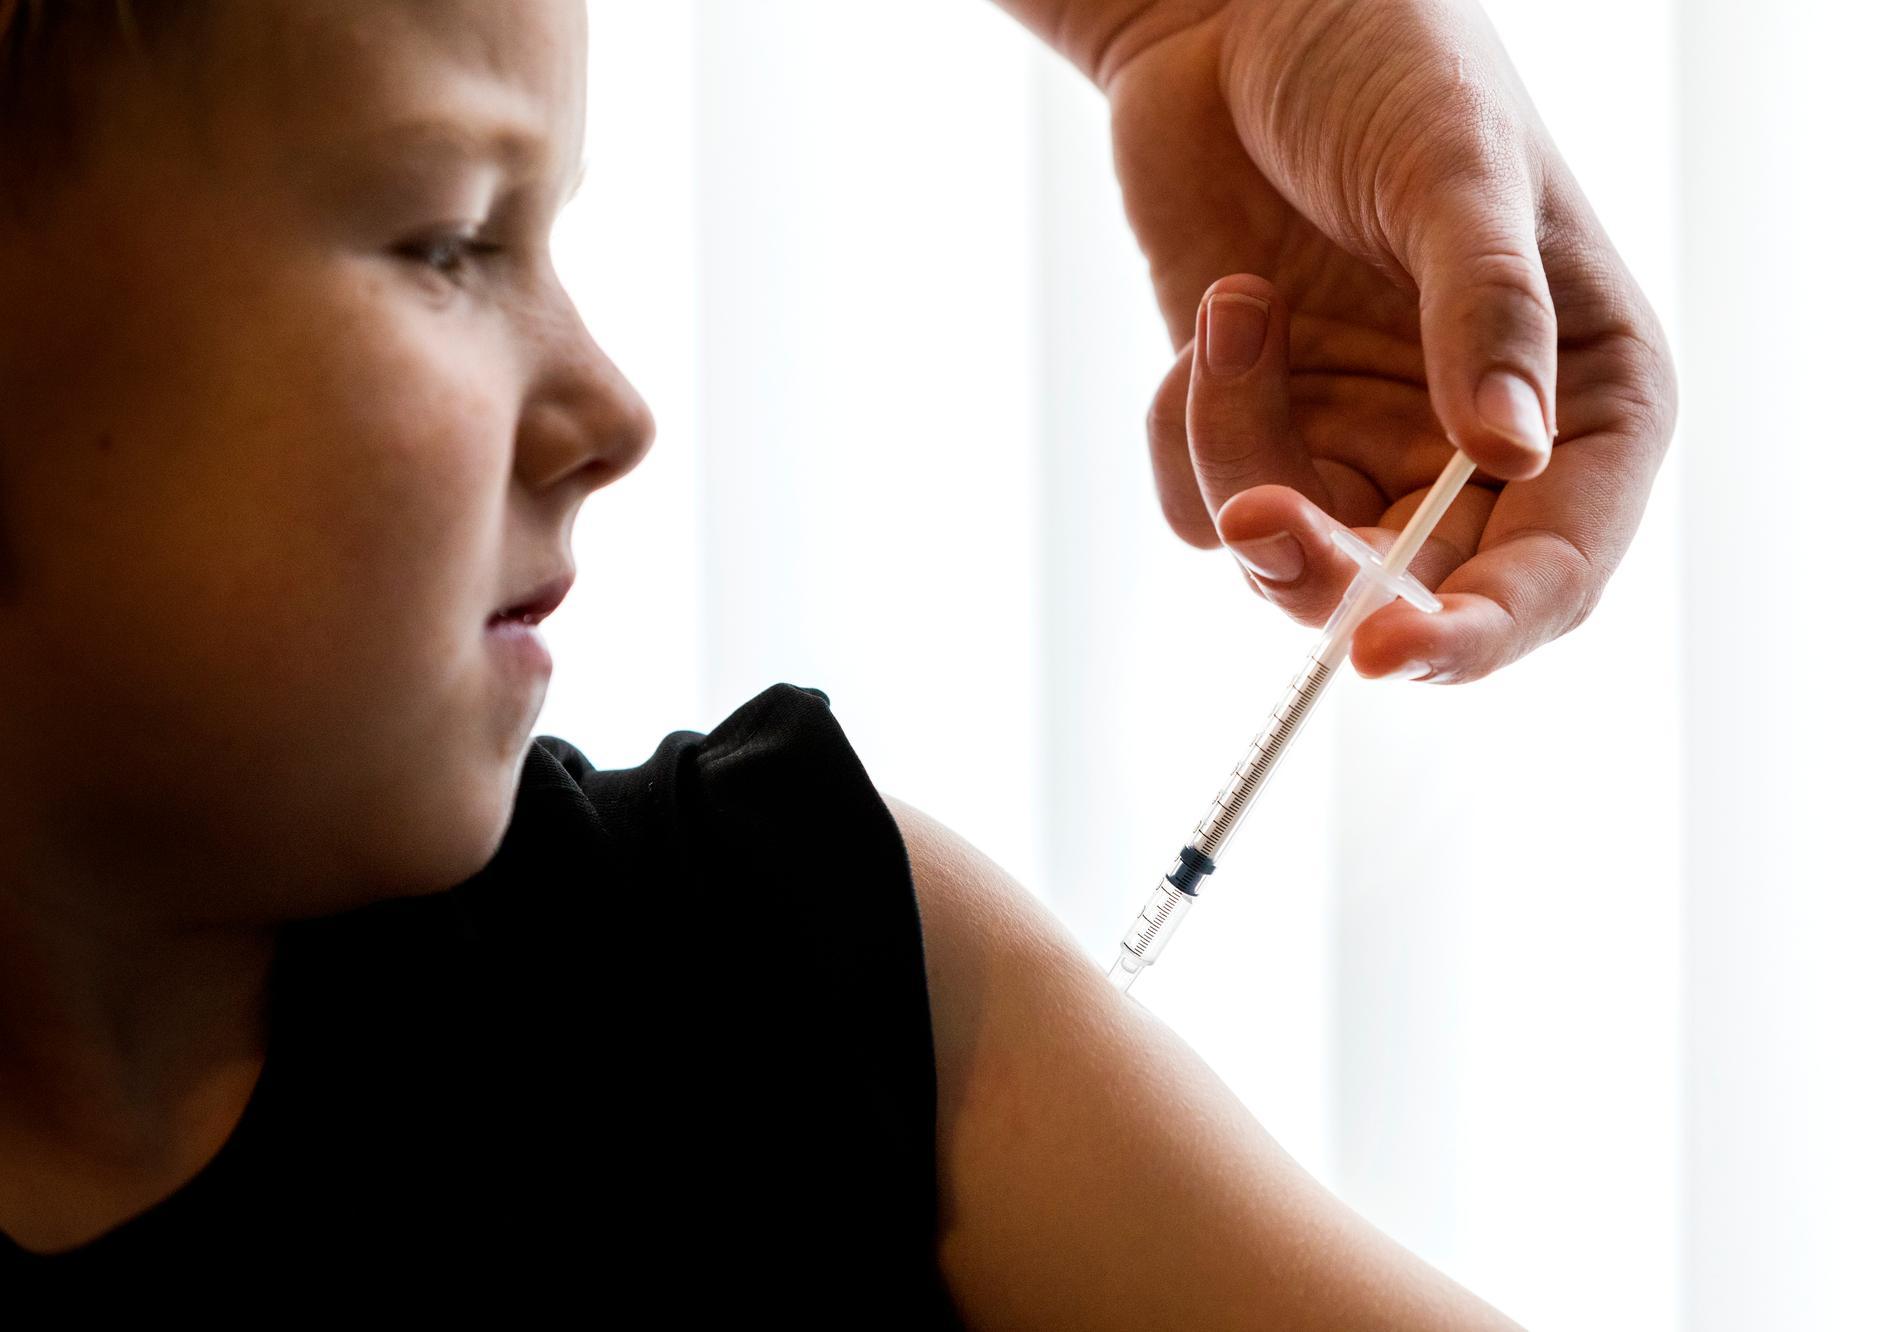 Så snart i tiden kommer barn få vaccin mot covid-19 gissar experterna.